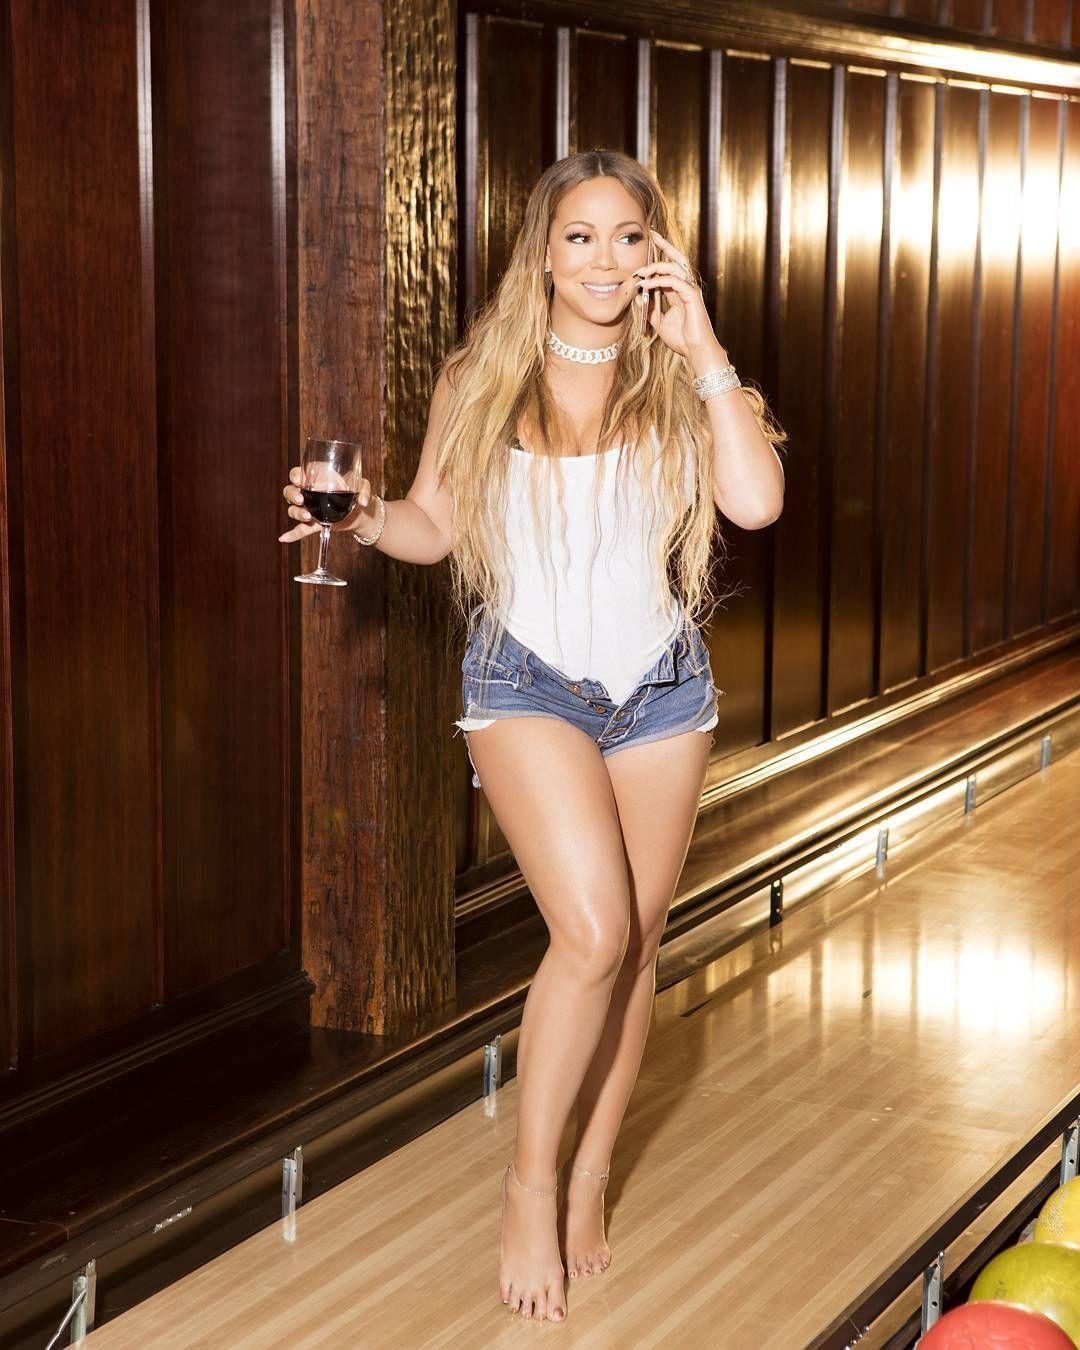 Foto: Mariah Carey, cantante / Instagram